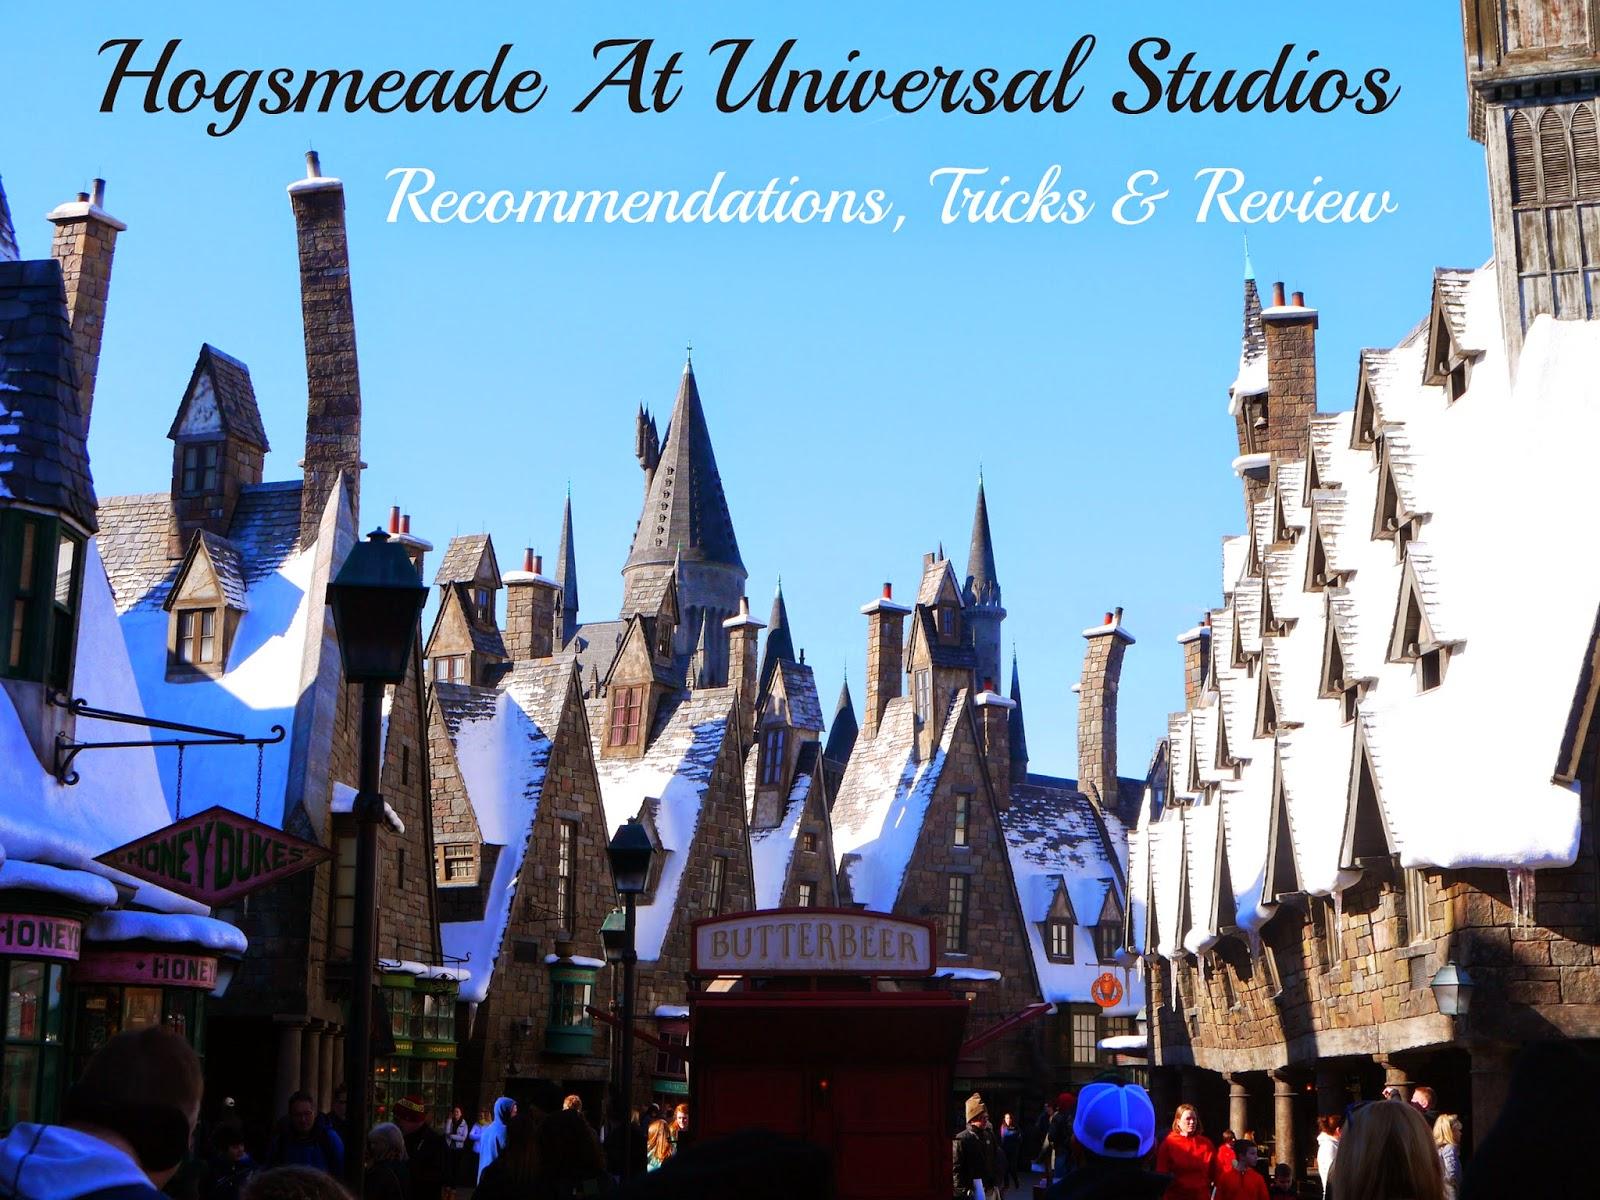 Hogsmeade At Universal Studios